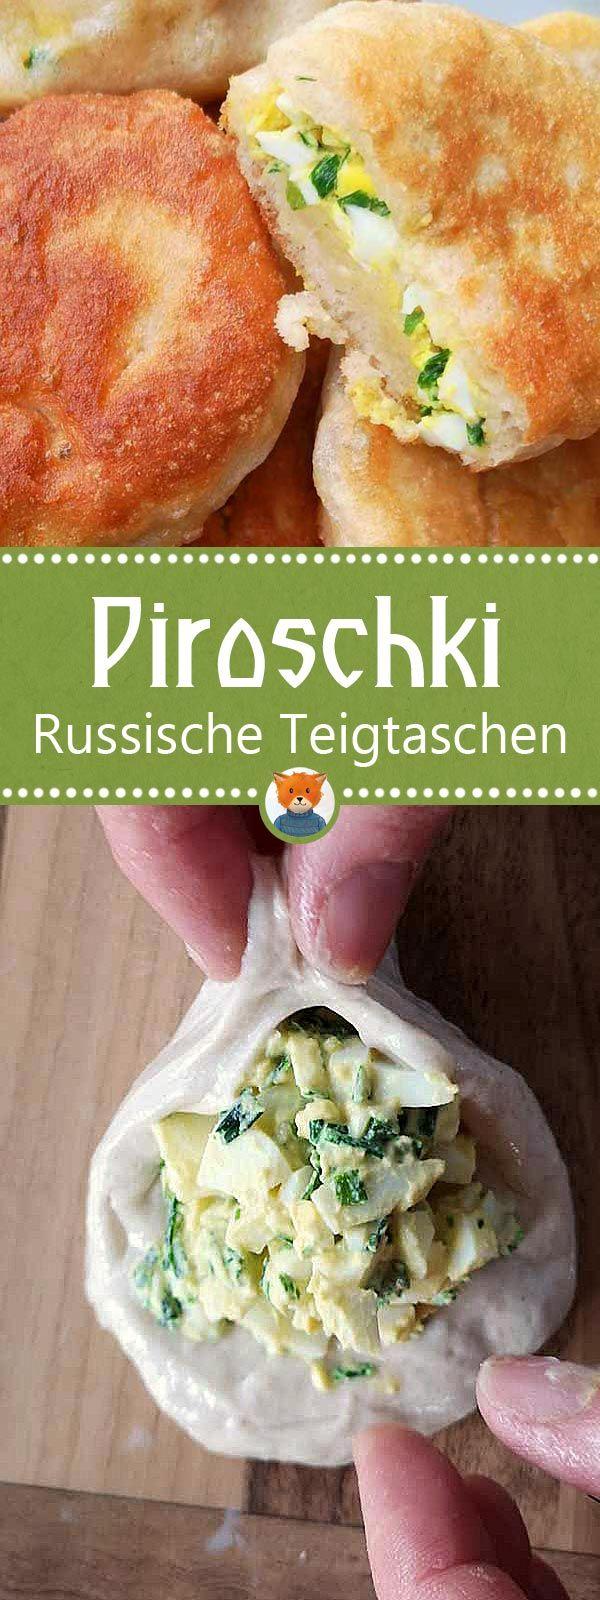 Photo of Piroshki recipe: Delicious Russian yeast dumplings | family fox 🦊